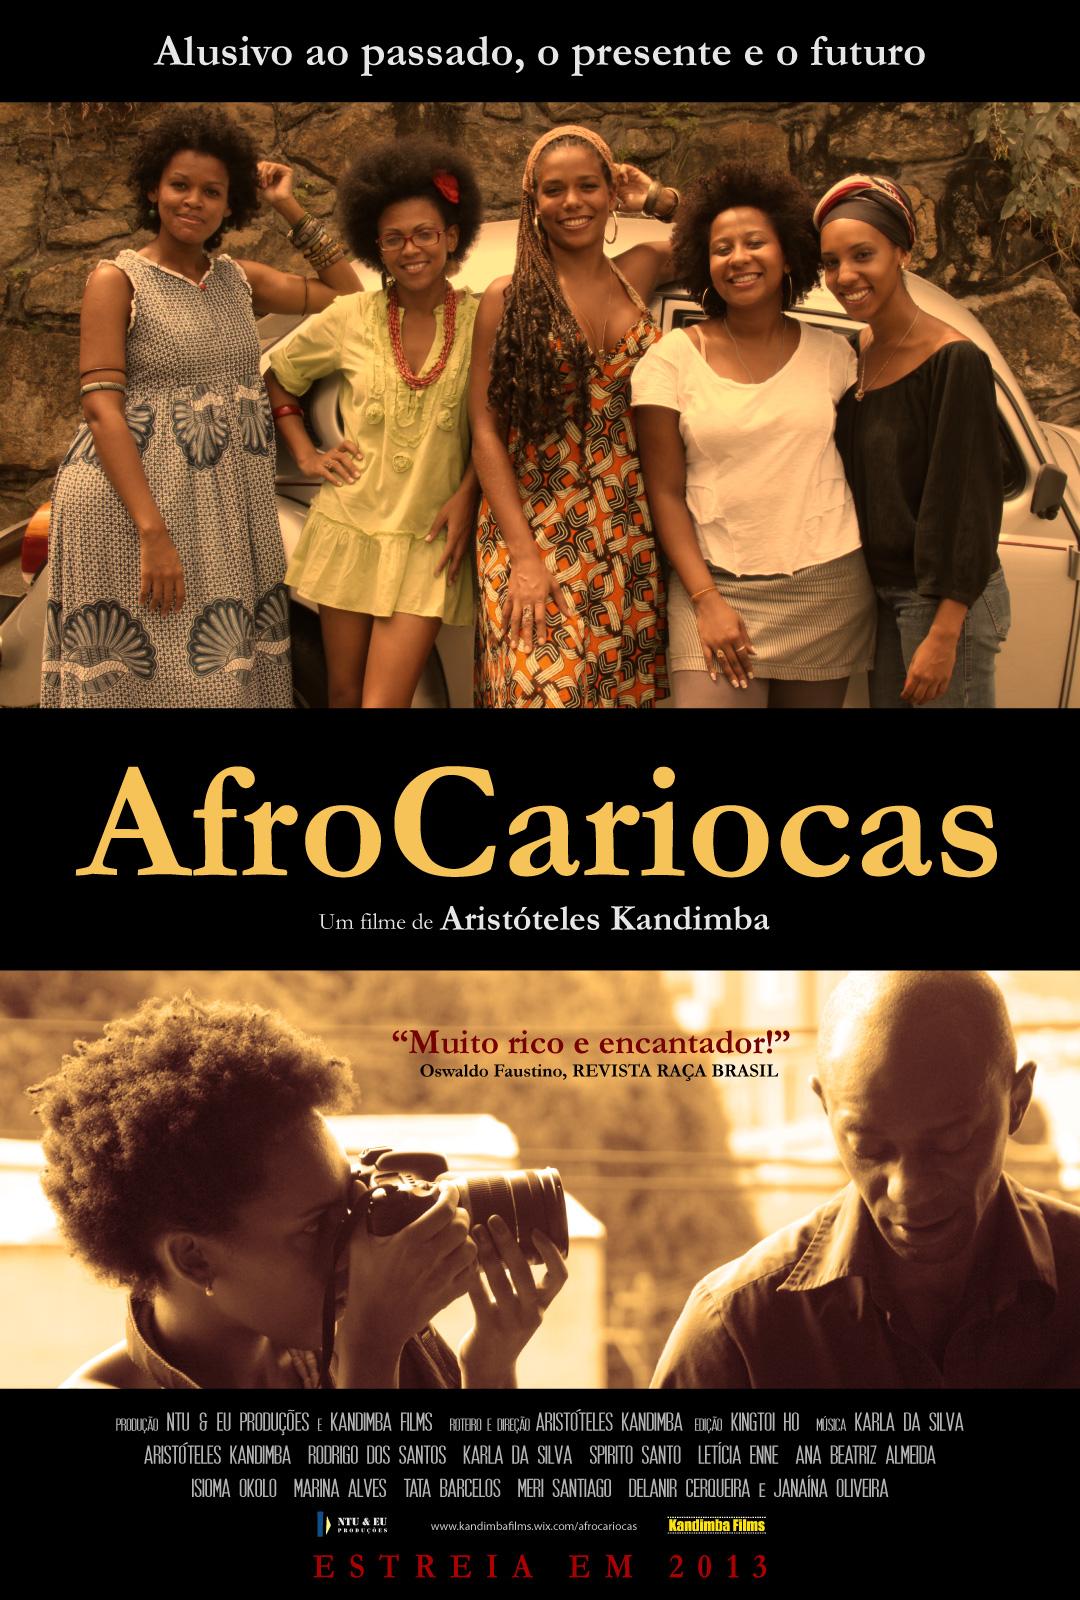 AfroCariocas